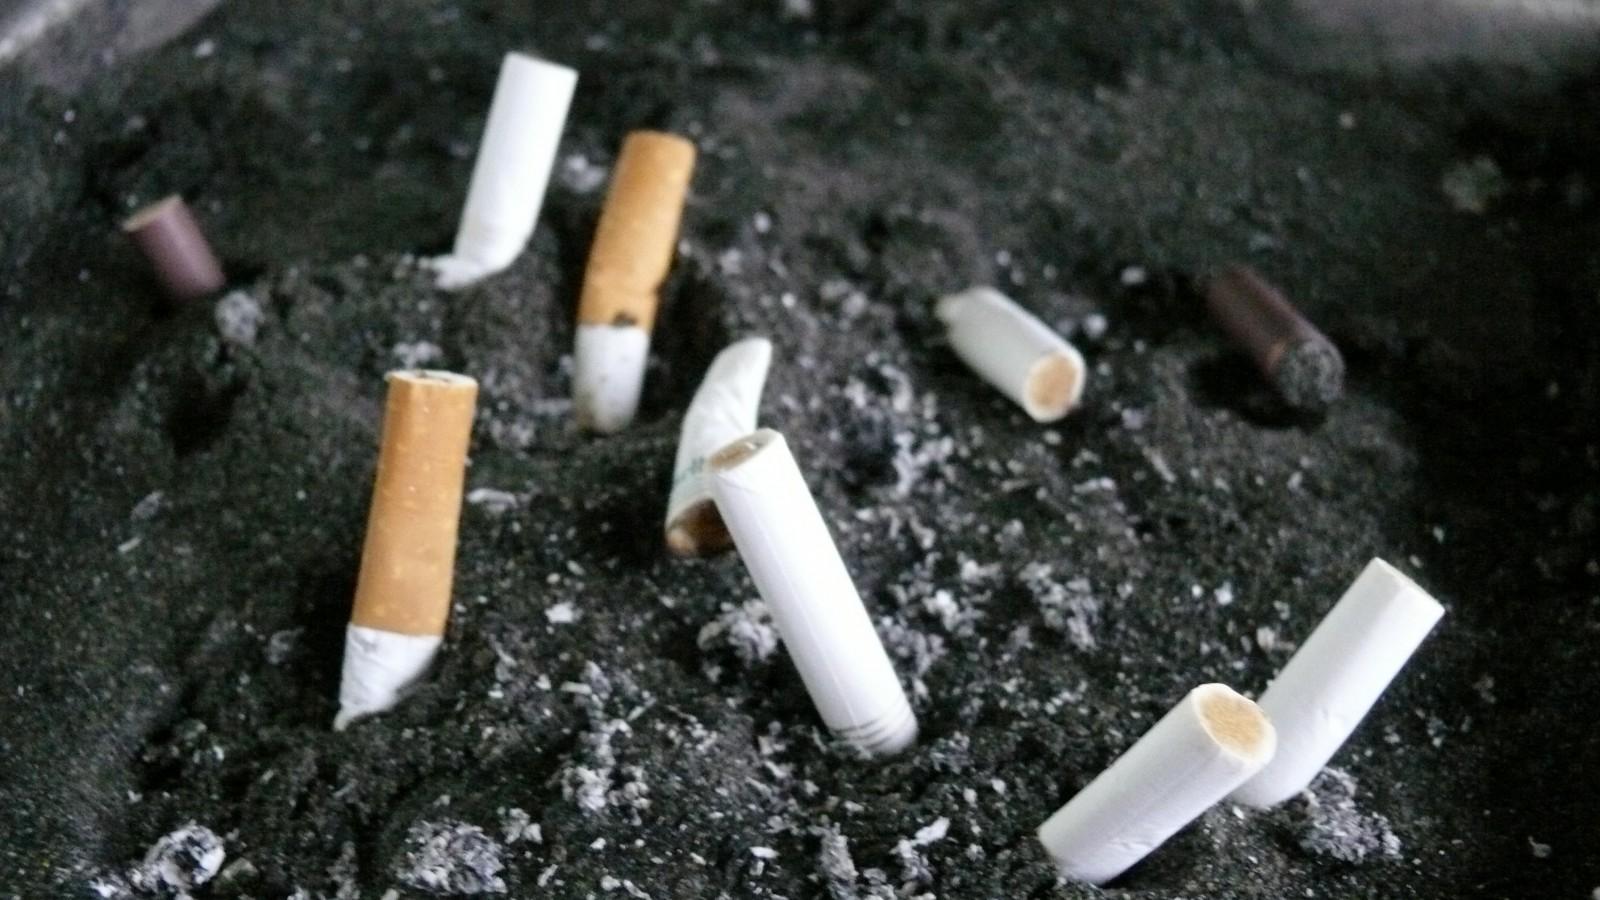 Kentucky Smoke-Free Advocates See Indiana Law as Cautionary Tale